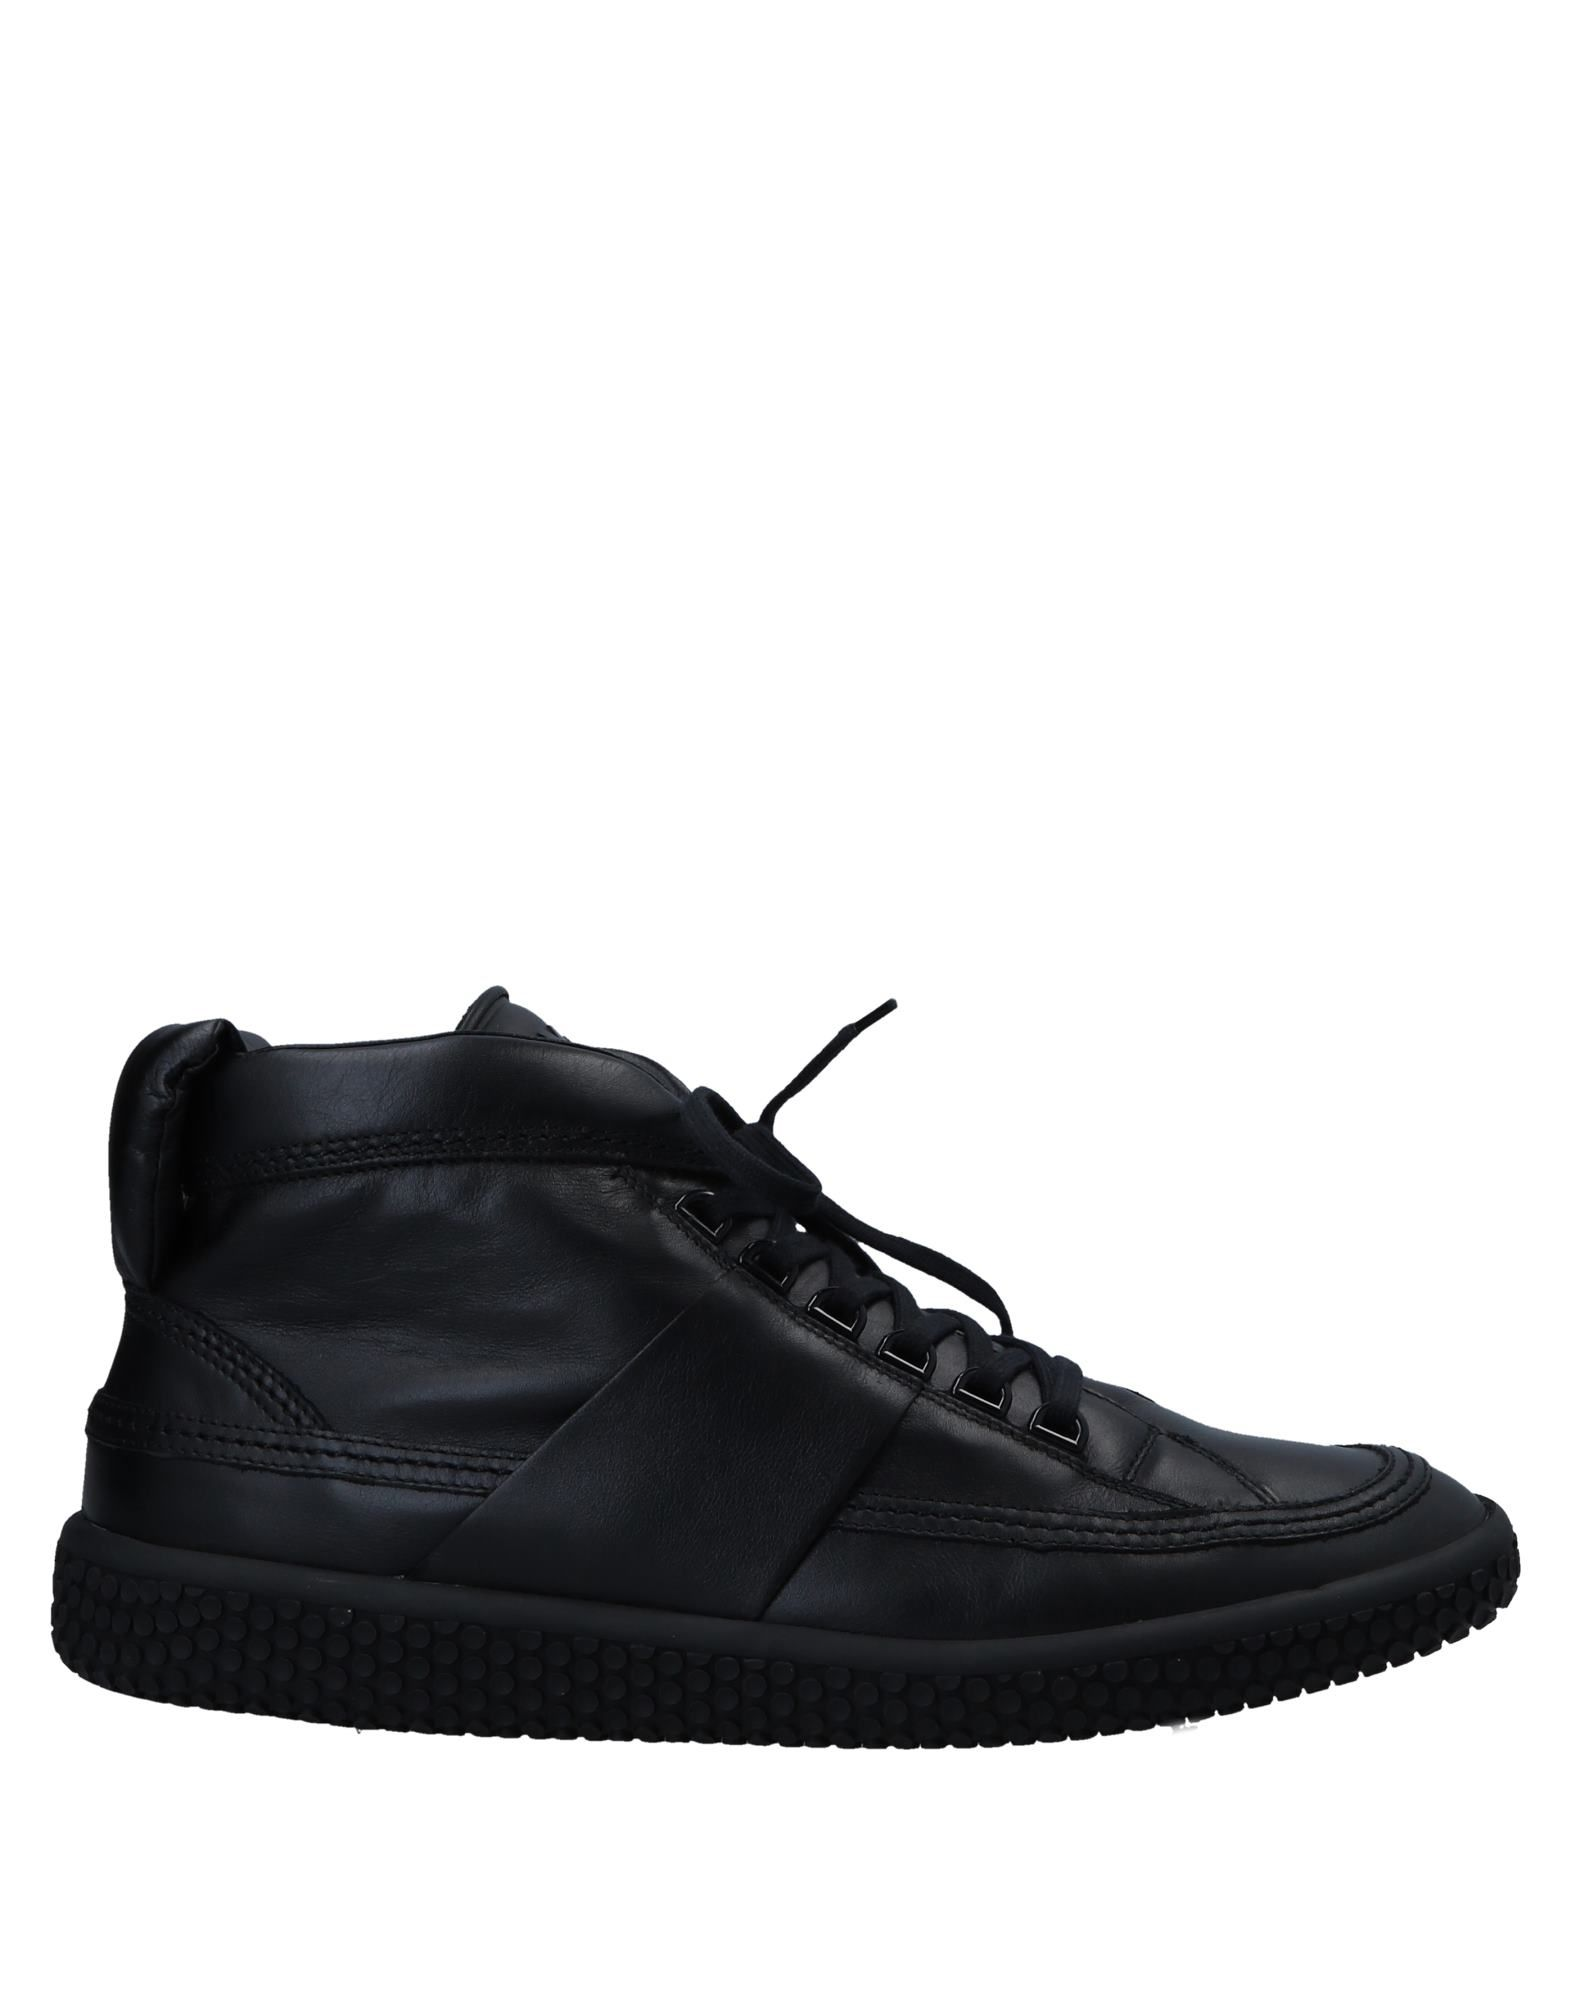 O.X.S. Sneakers Herren  11552366KO Gute Qualität beliebte Schuhe